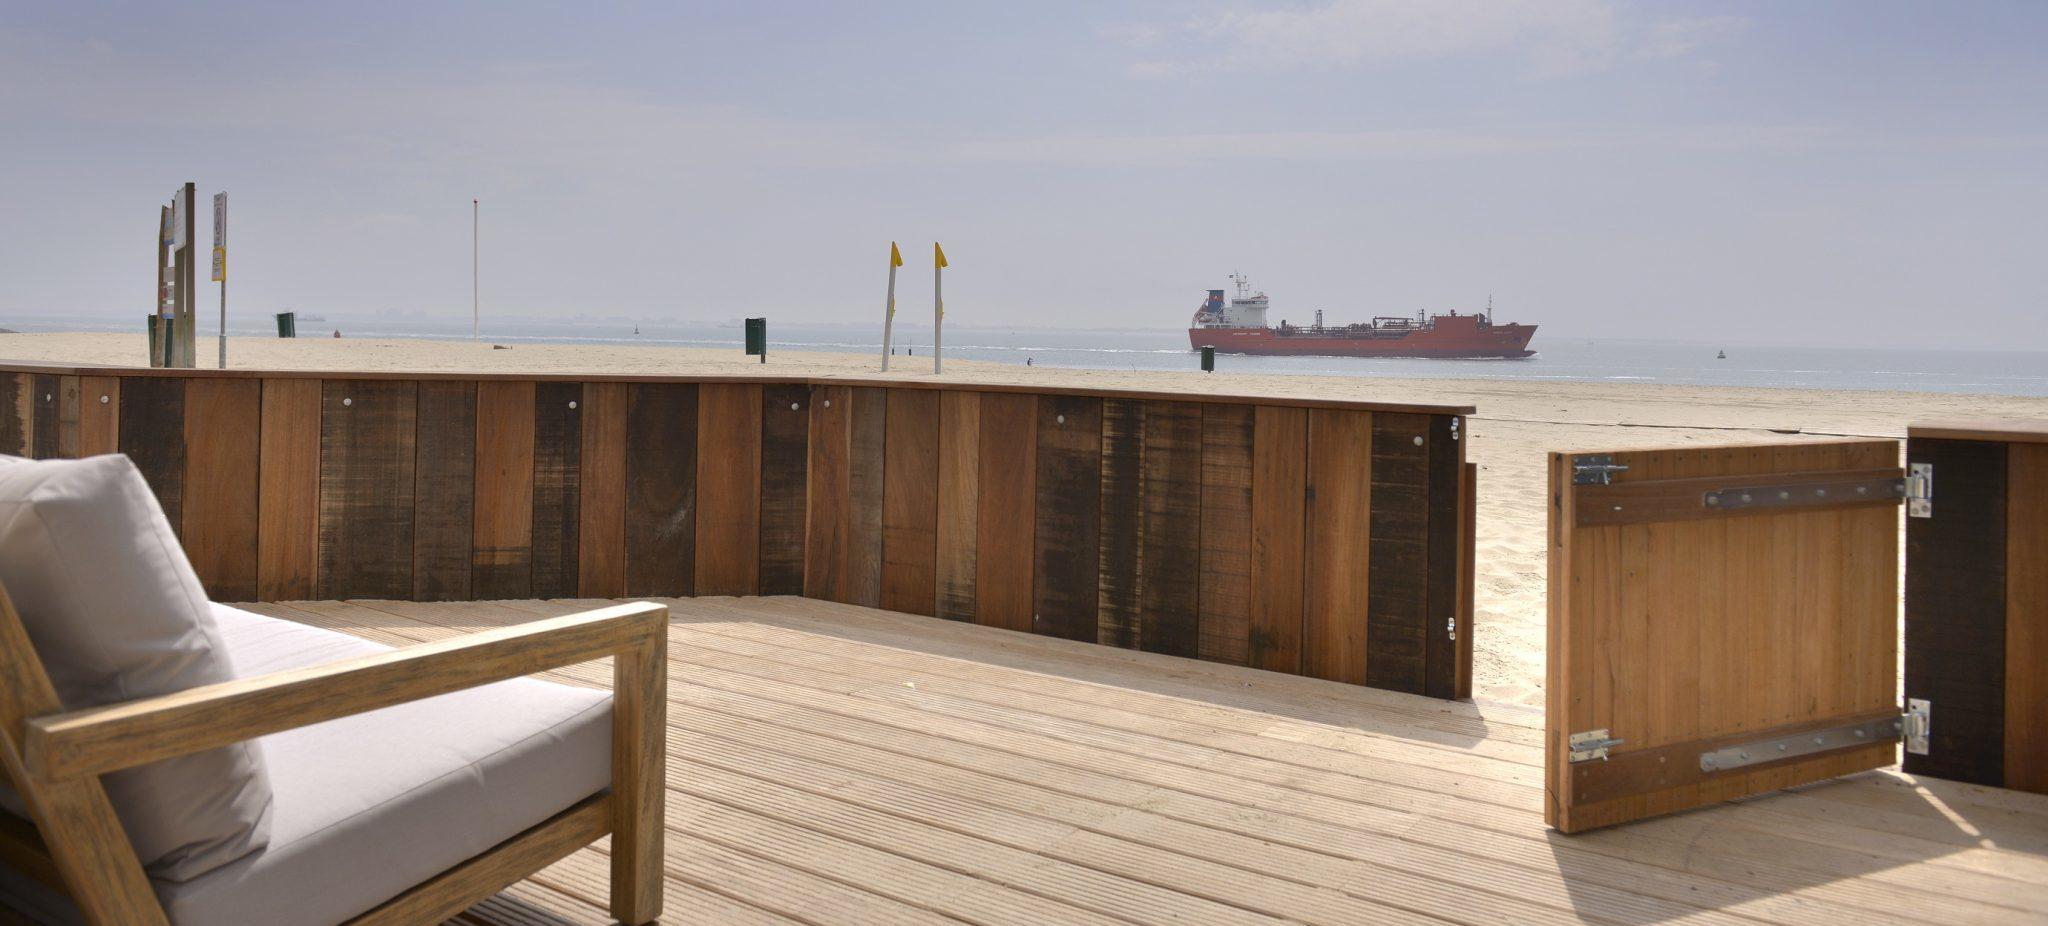 Supertrips - Beachrooms Zandpaviljoen Pier 7